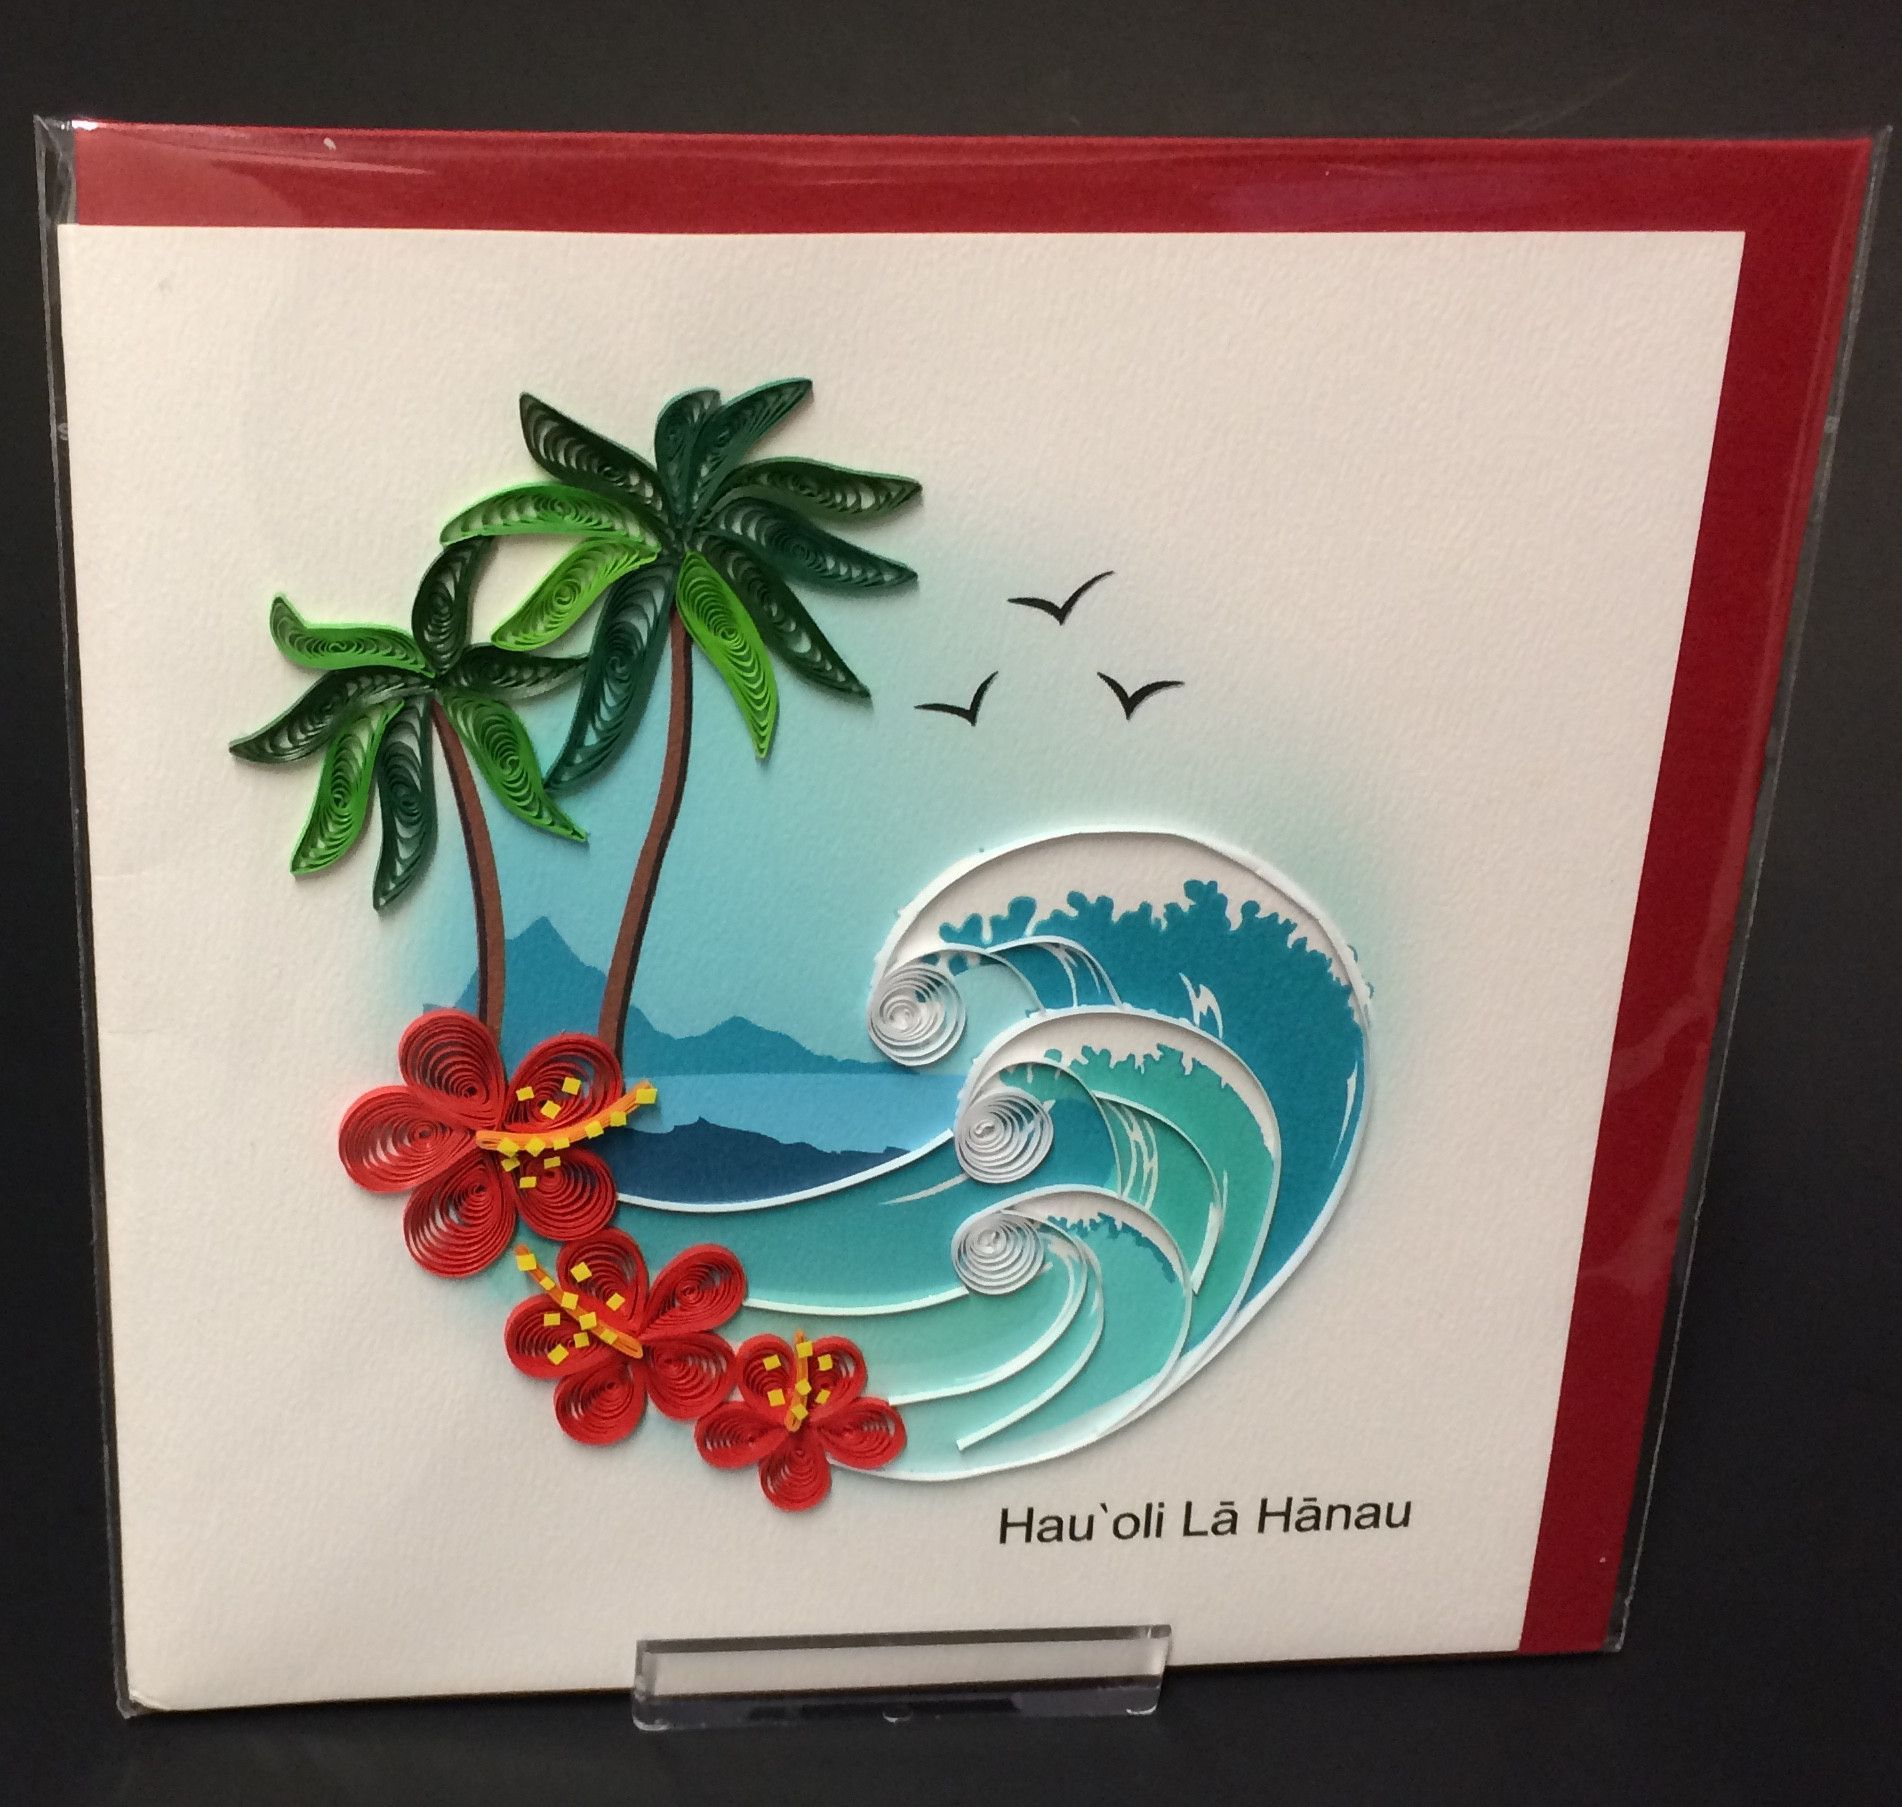 Happy birthday card in hawaiian with a beach scene with palm trees happy birthday card in hawaiian with a beach scene with palm trees kristyandbryce Gallery